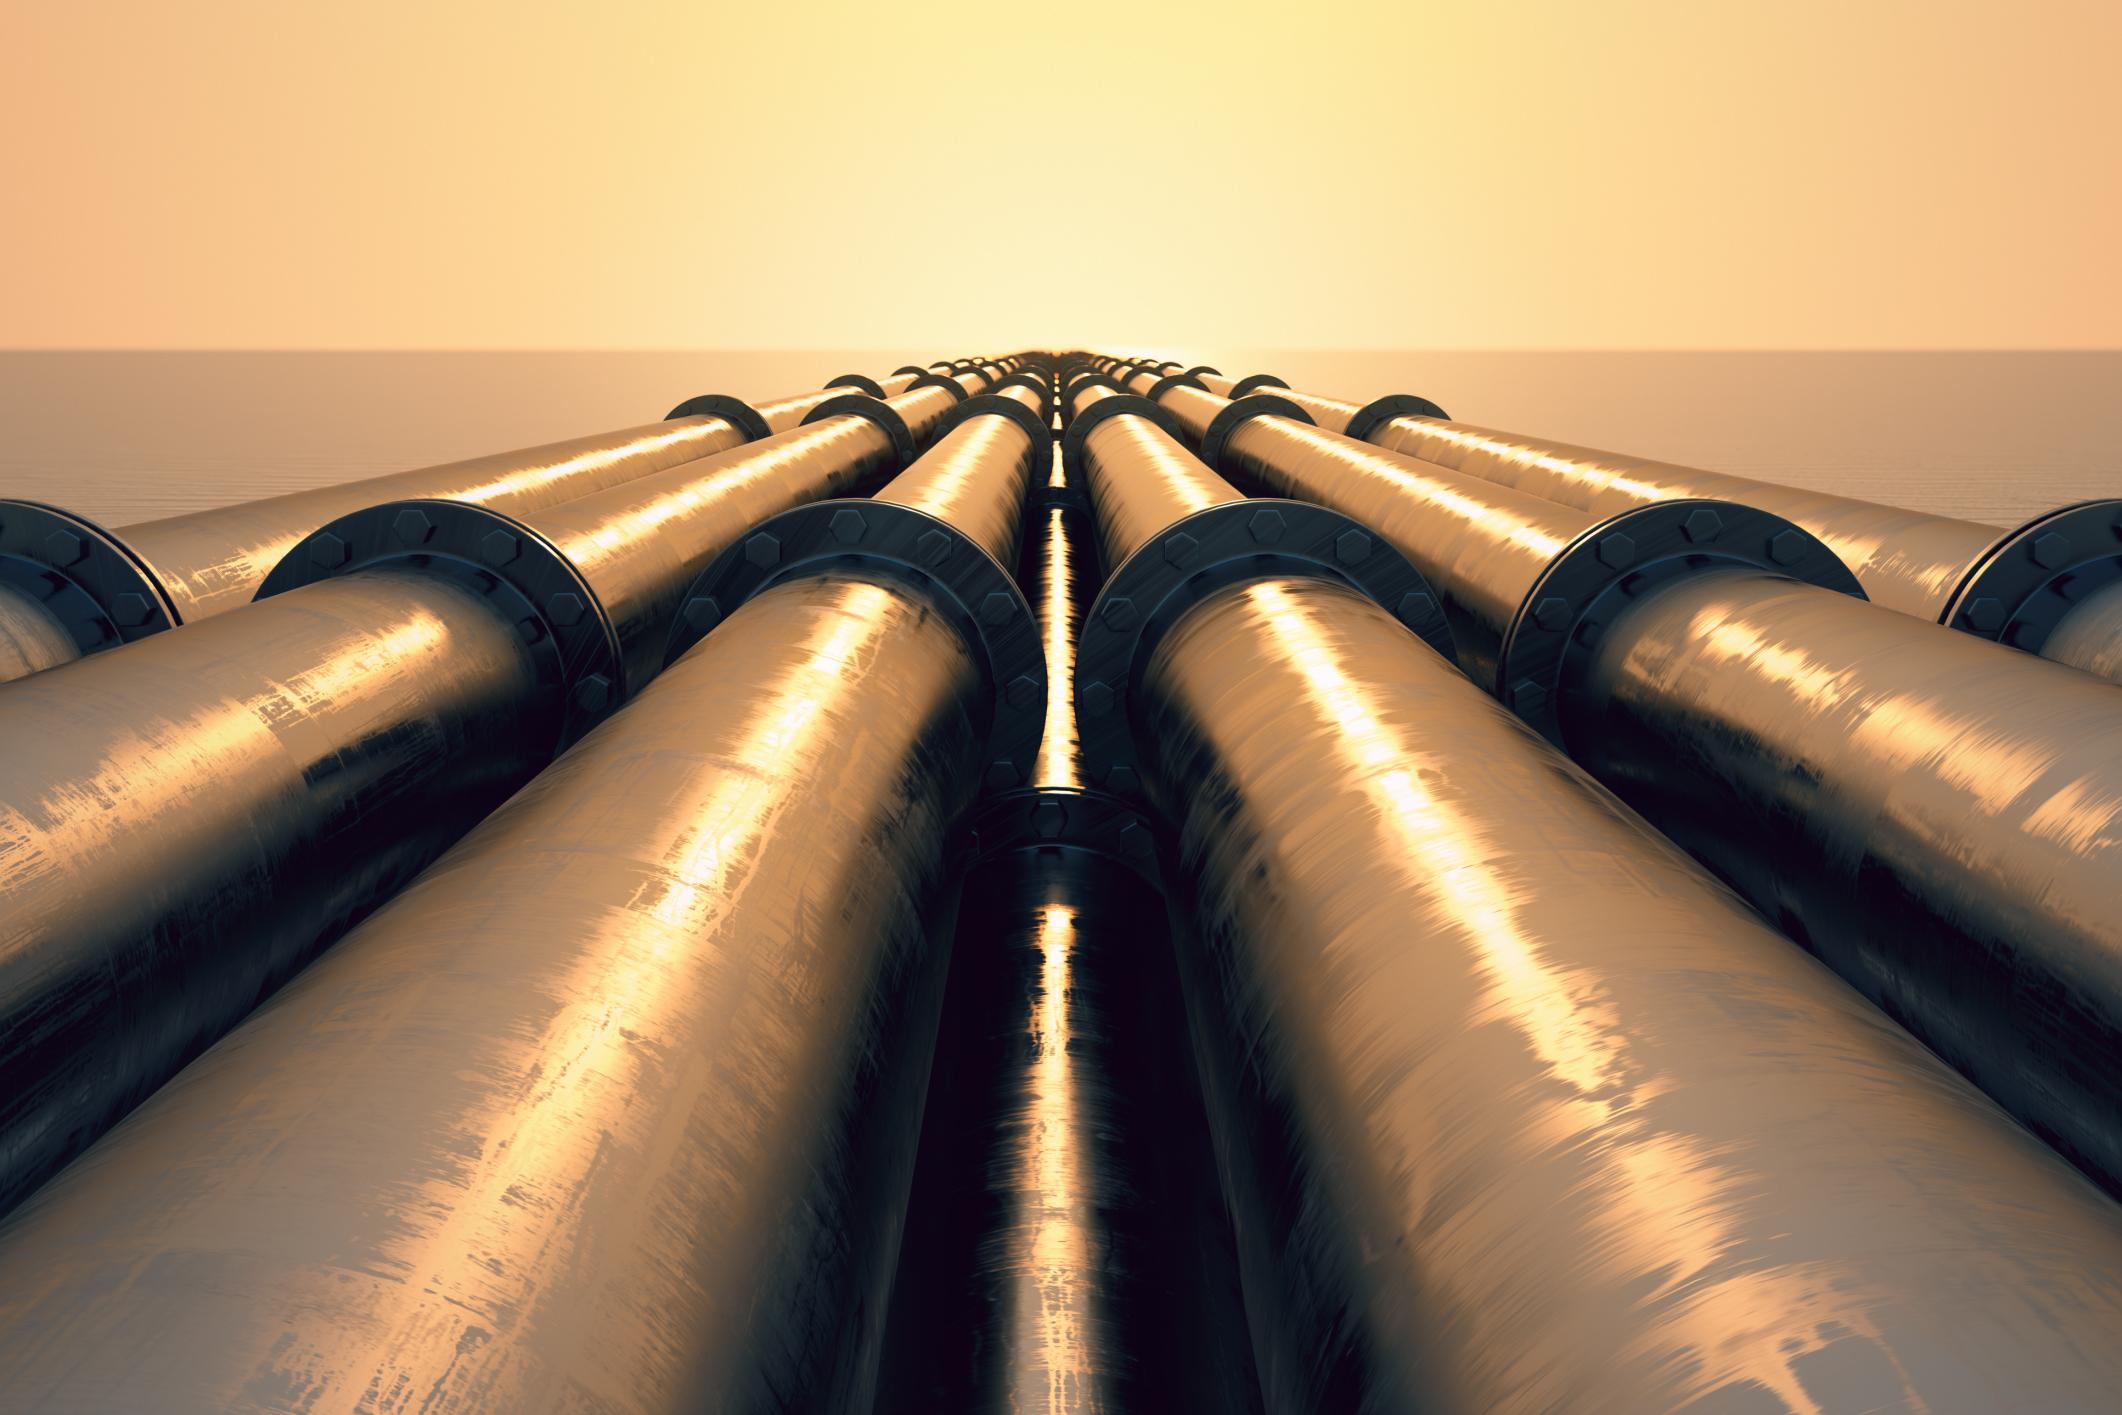 В Актобе из-за нехватки газа построят новую нитку газопровода Бухара – Урал